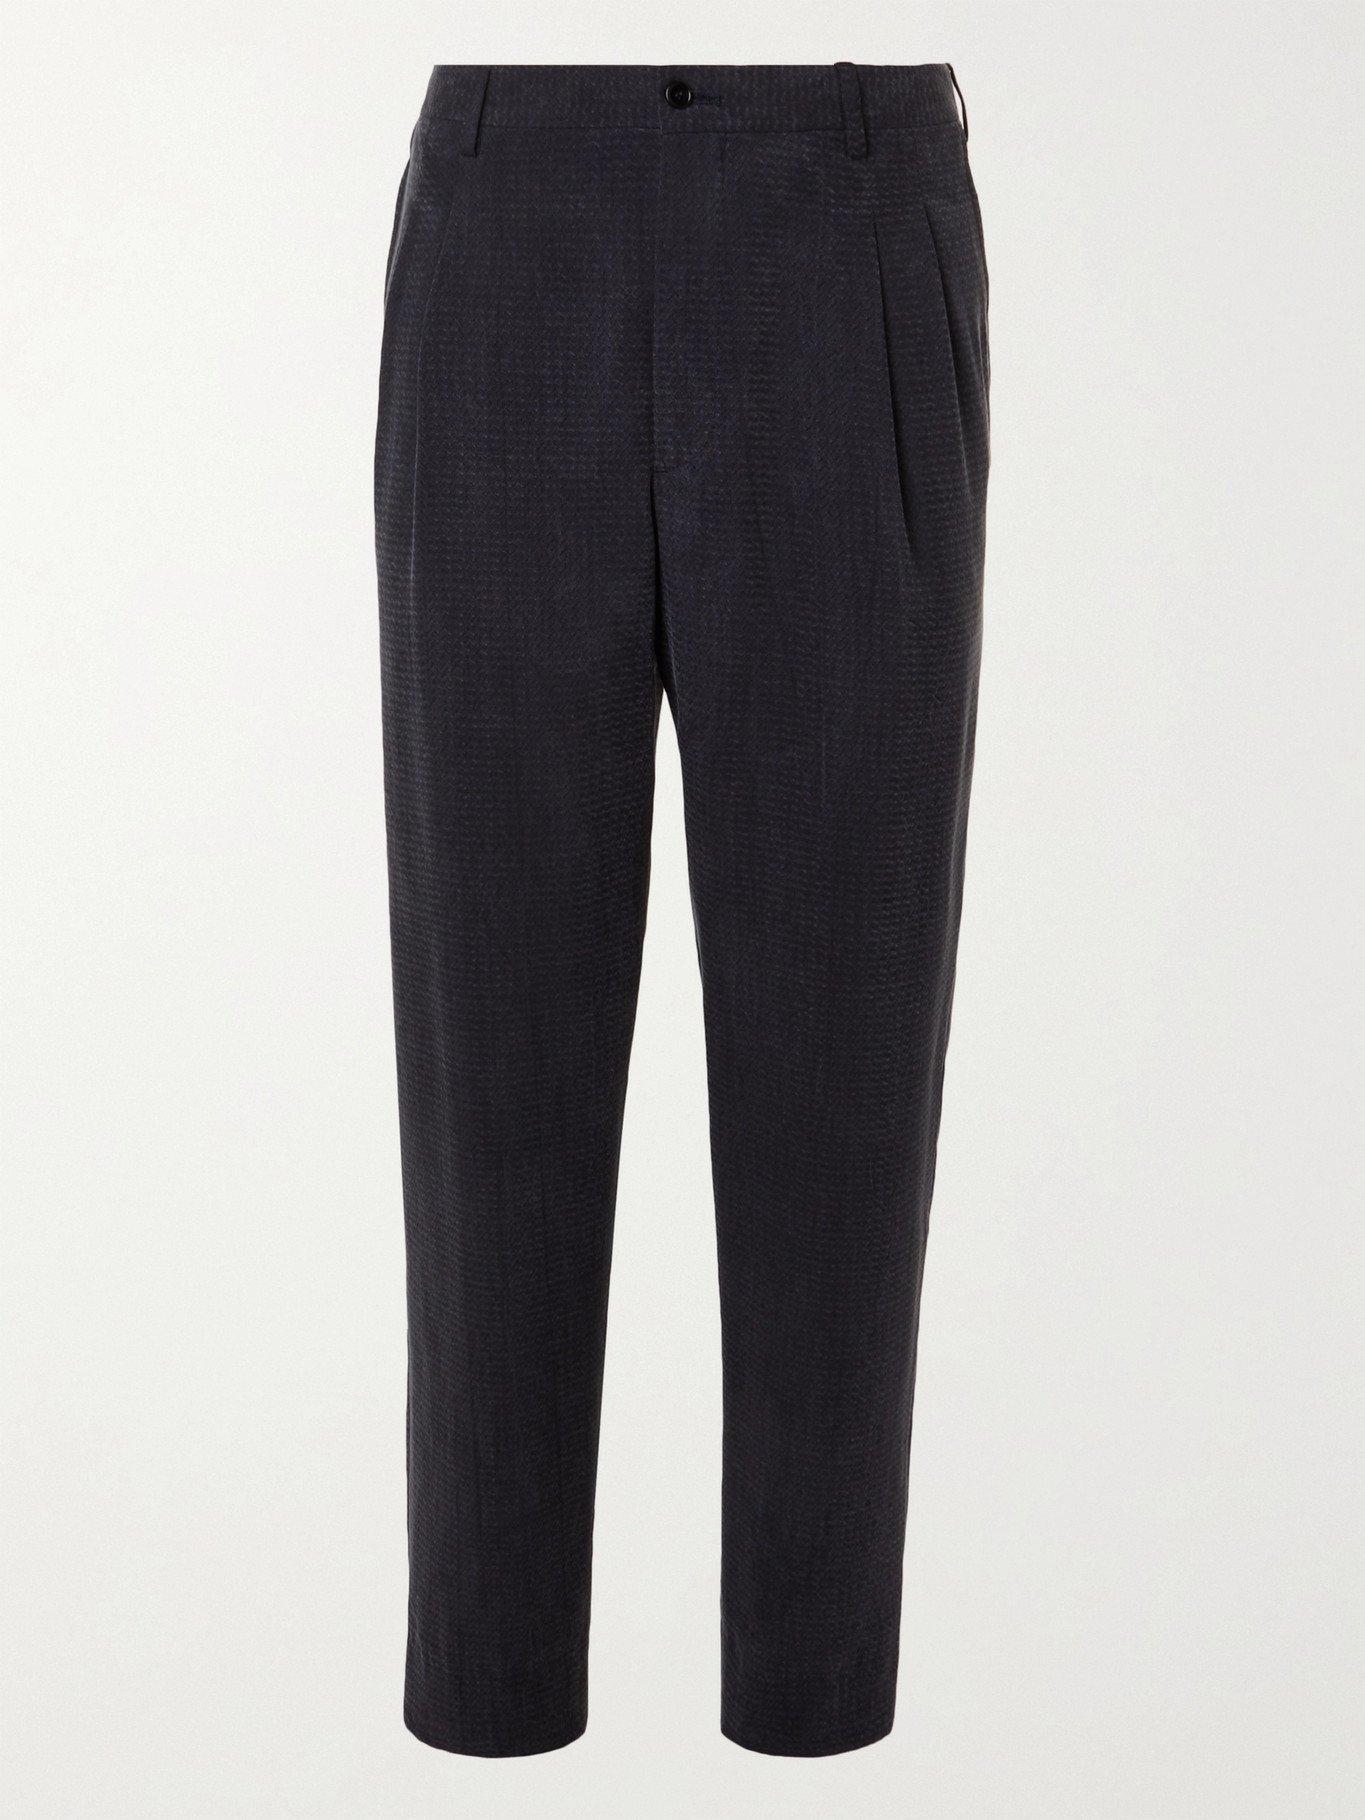 GIORGIO ARMANI - Pleated Herringbone-Jacquard Trousers - Blue - IT 48